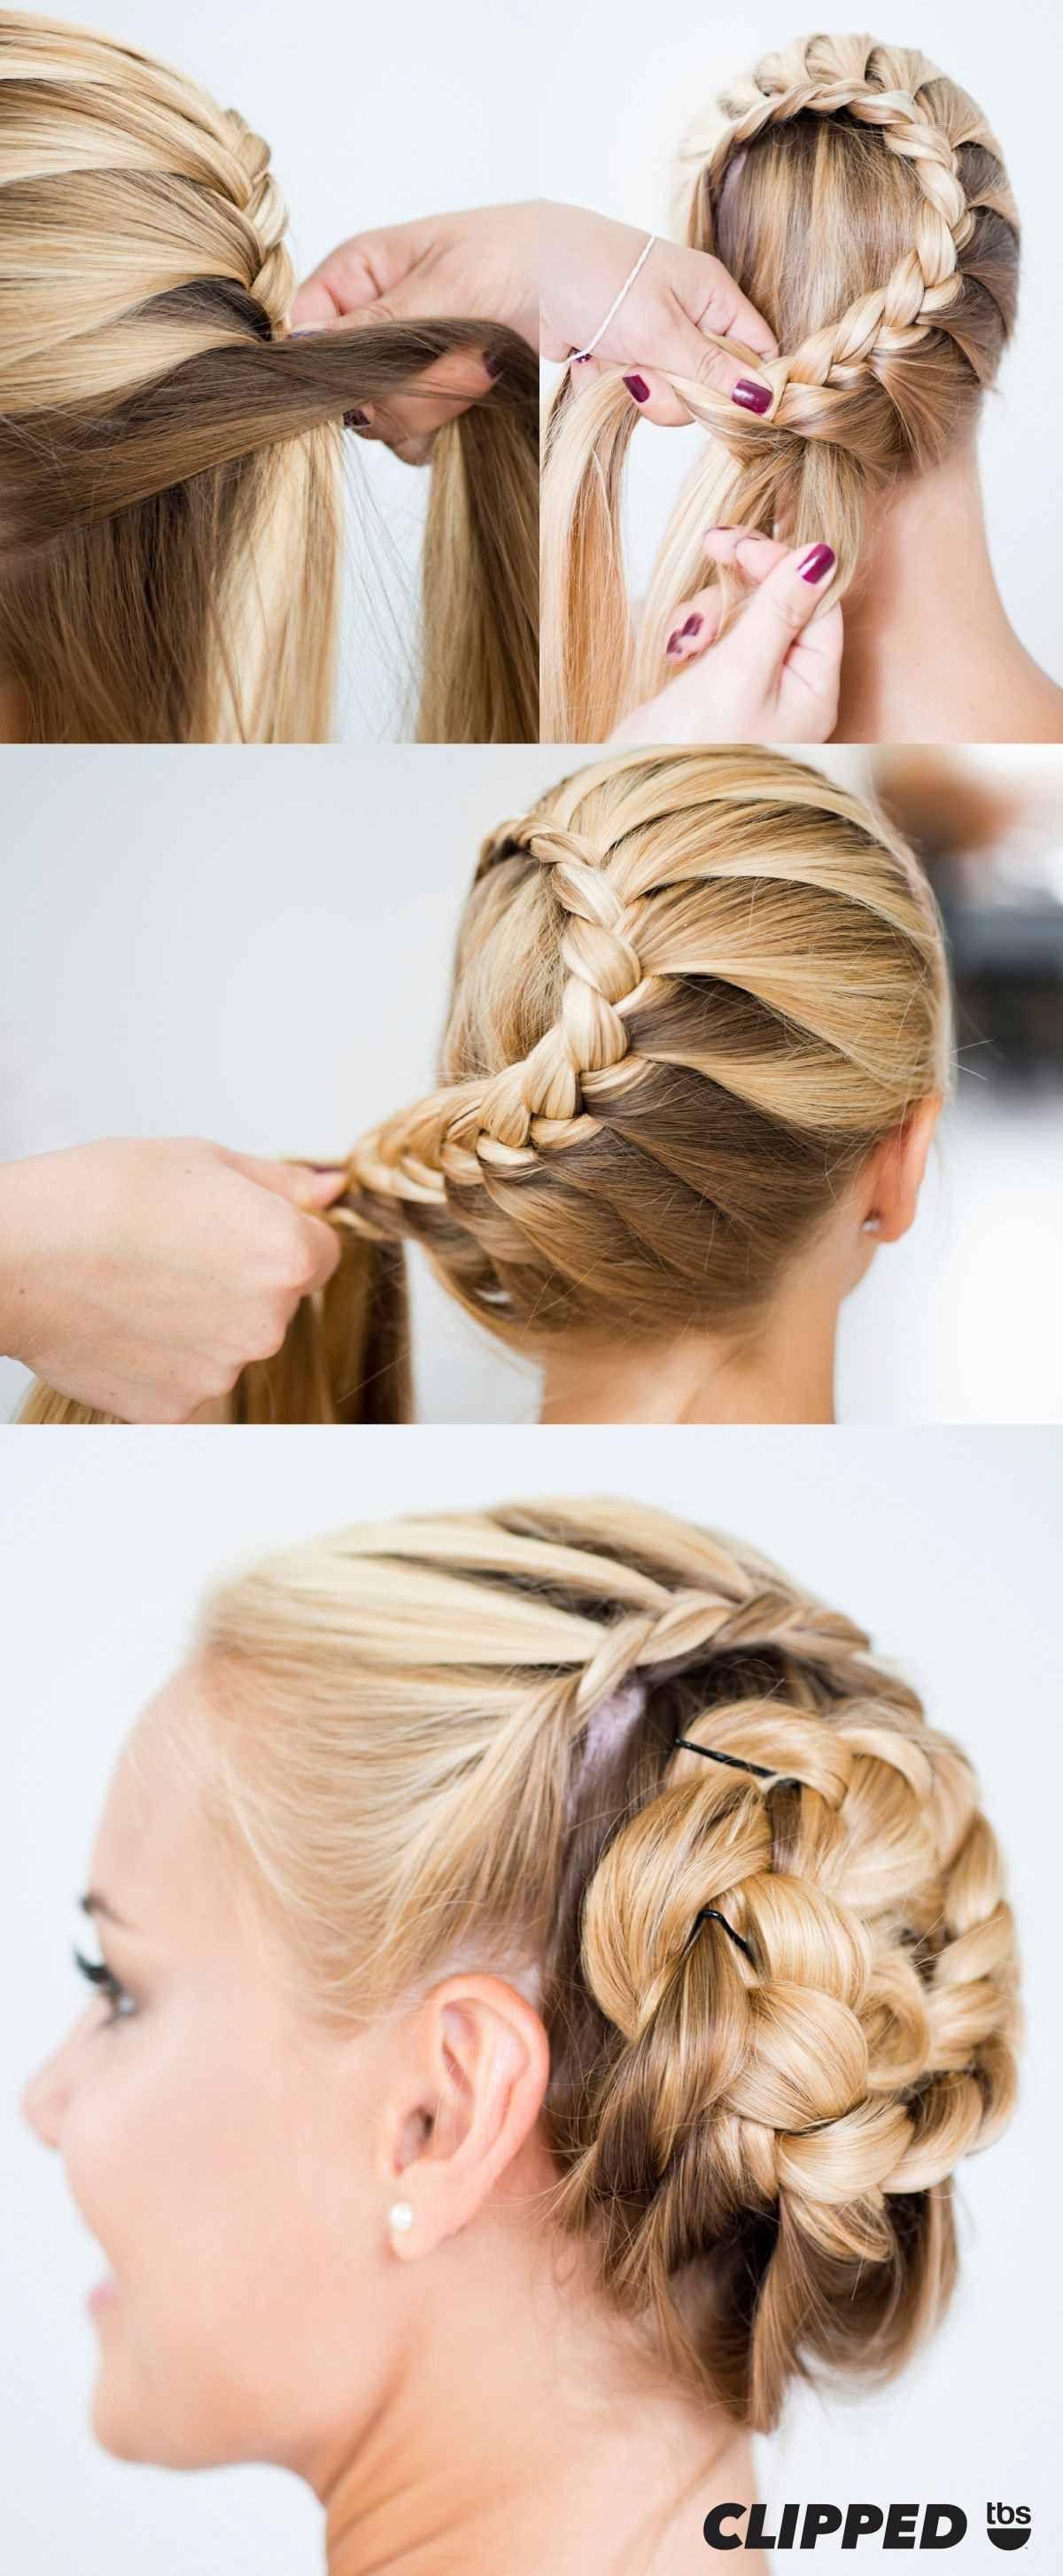 Watch Cute Braided Hairstyles: Ashley Tisdale Hair video